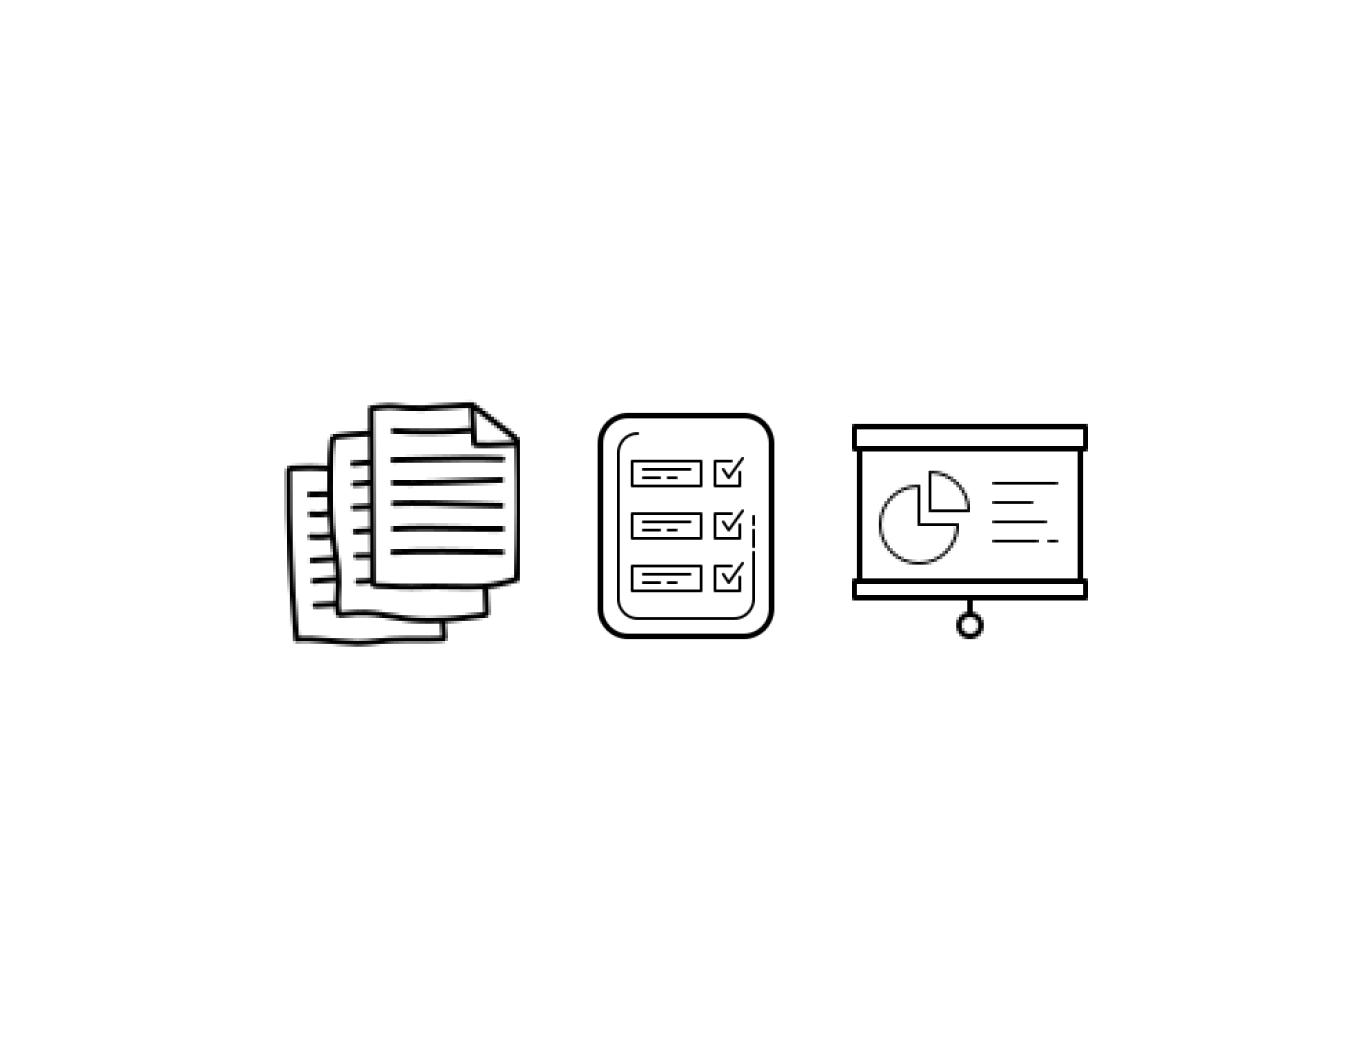 Symbols for Presentation